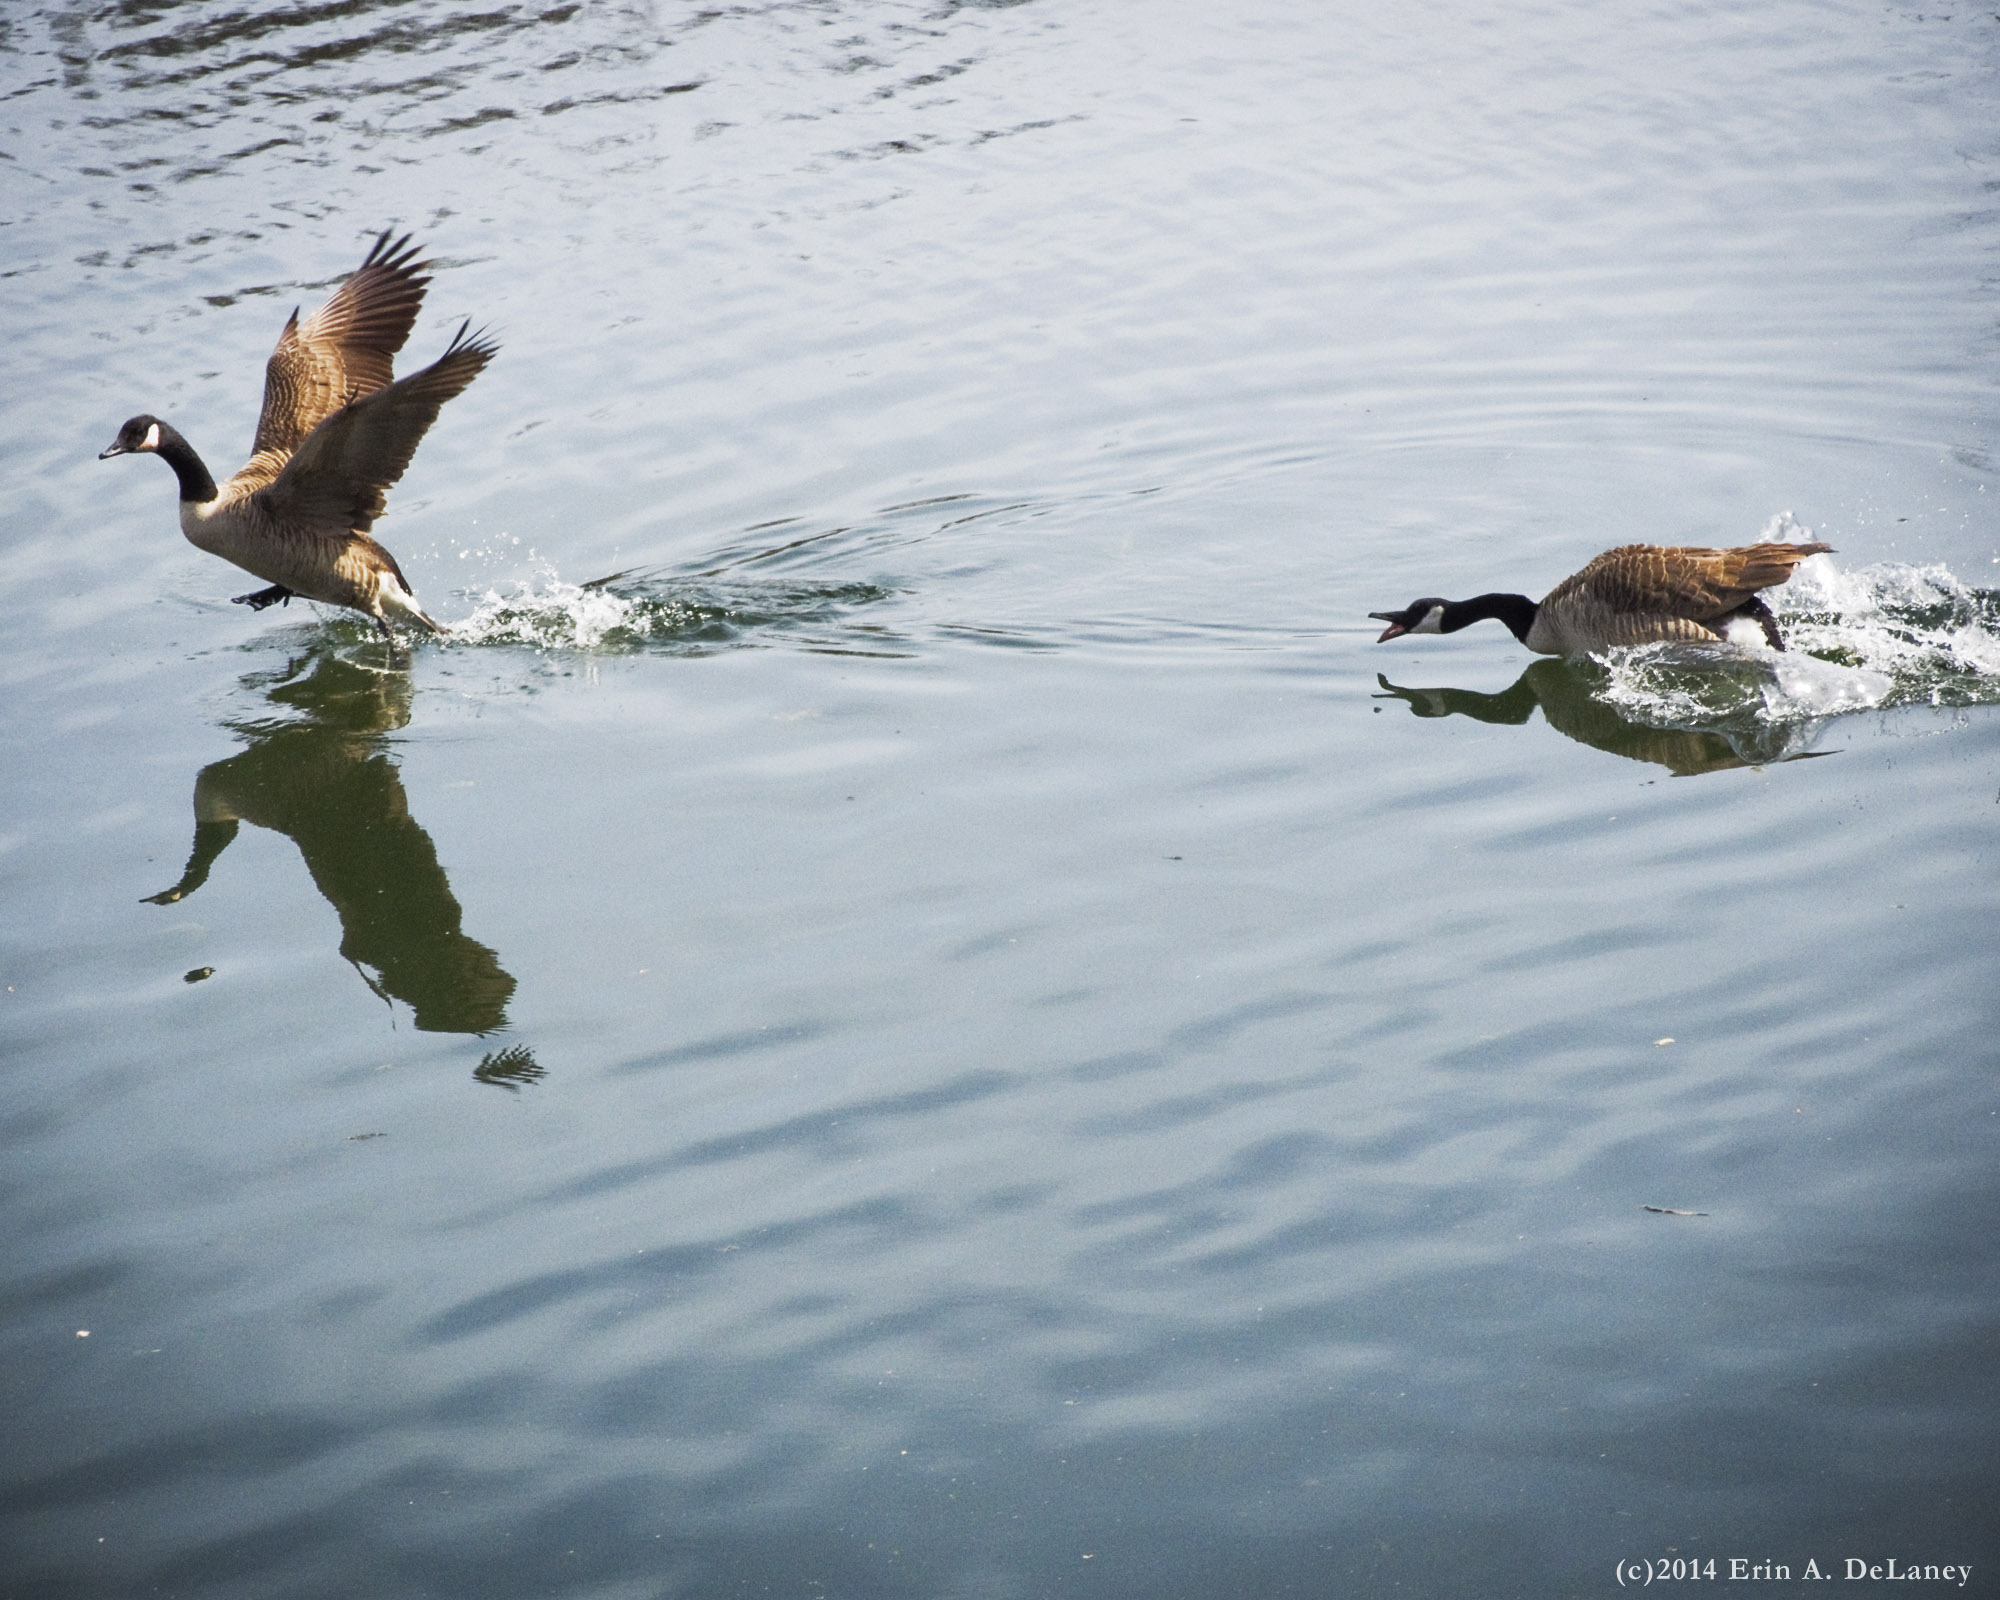 Wild Goose Chase, 2014